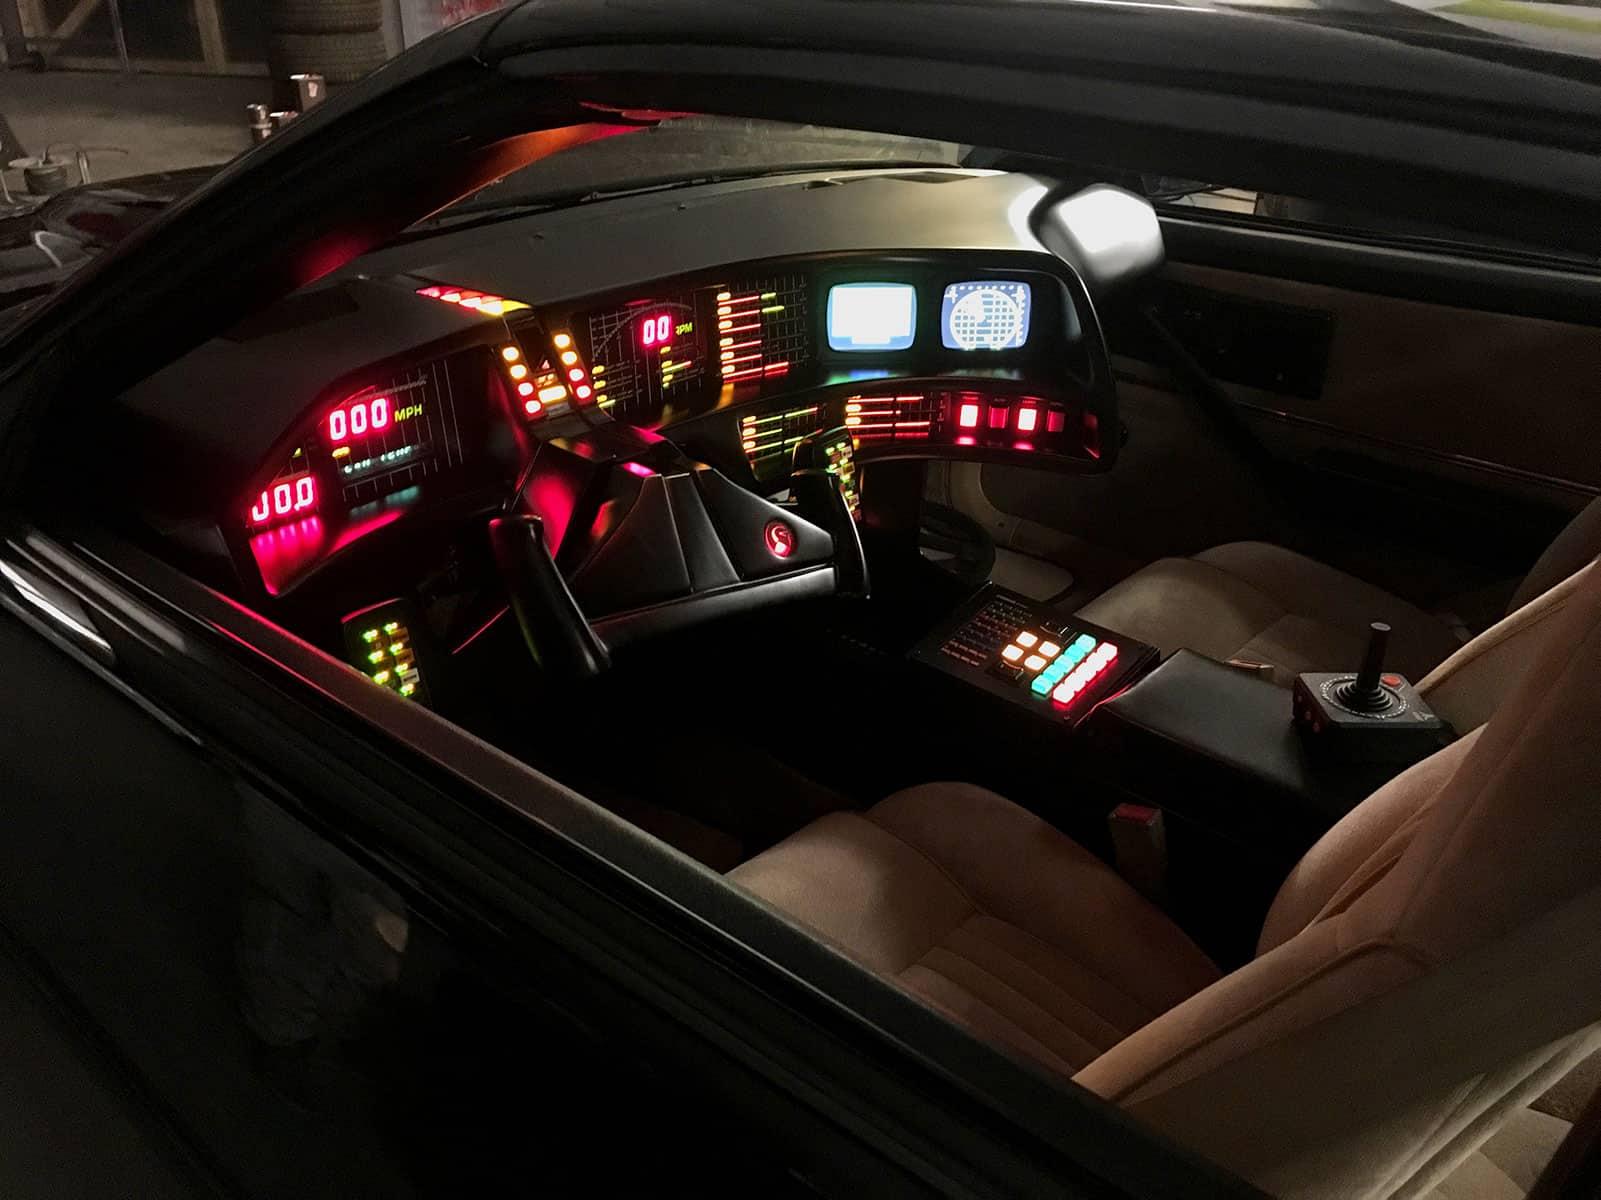 KITT Replika Dashboard Interior Knight of Germany im dunkeln